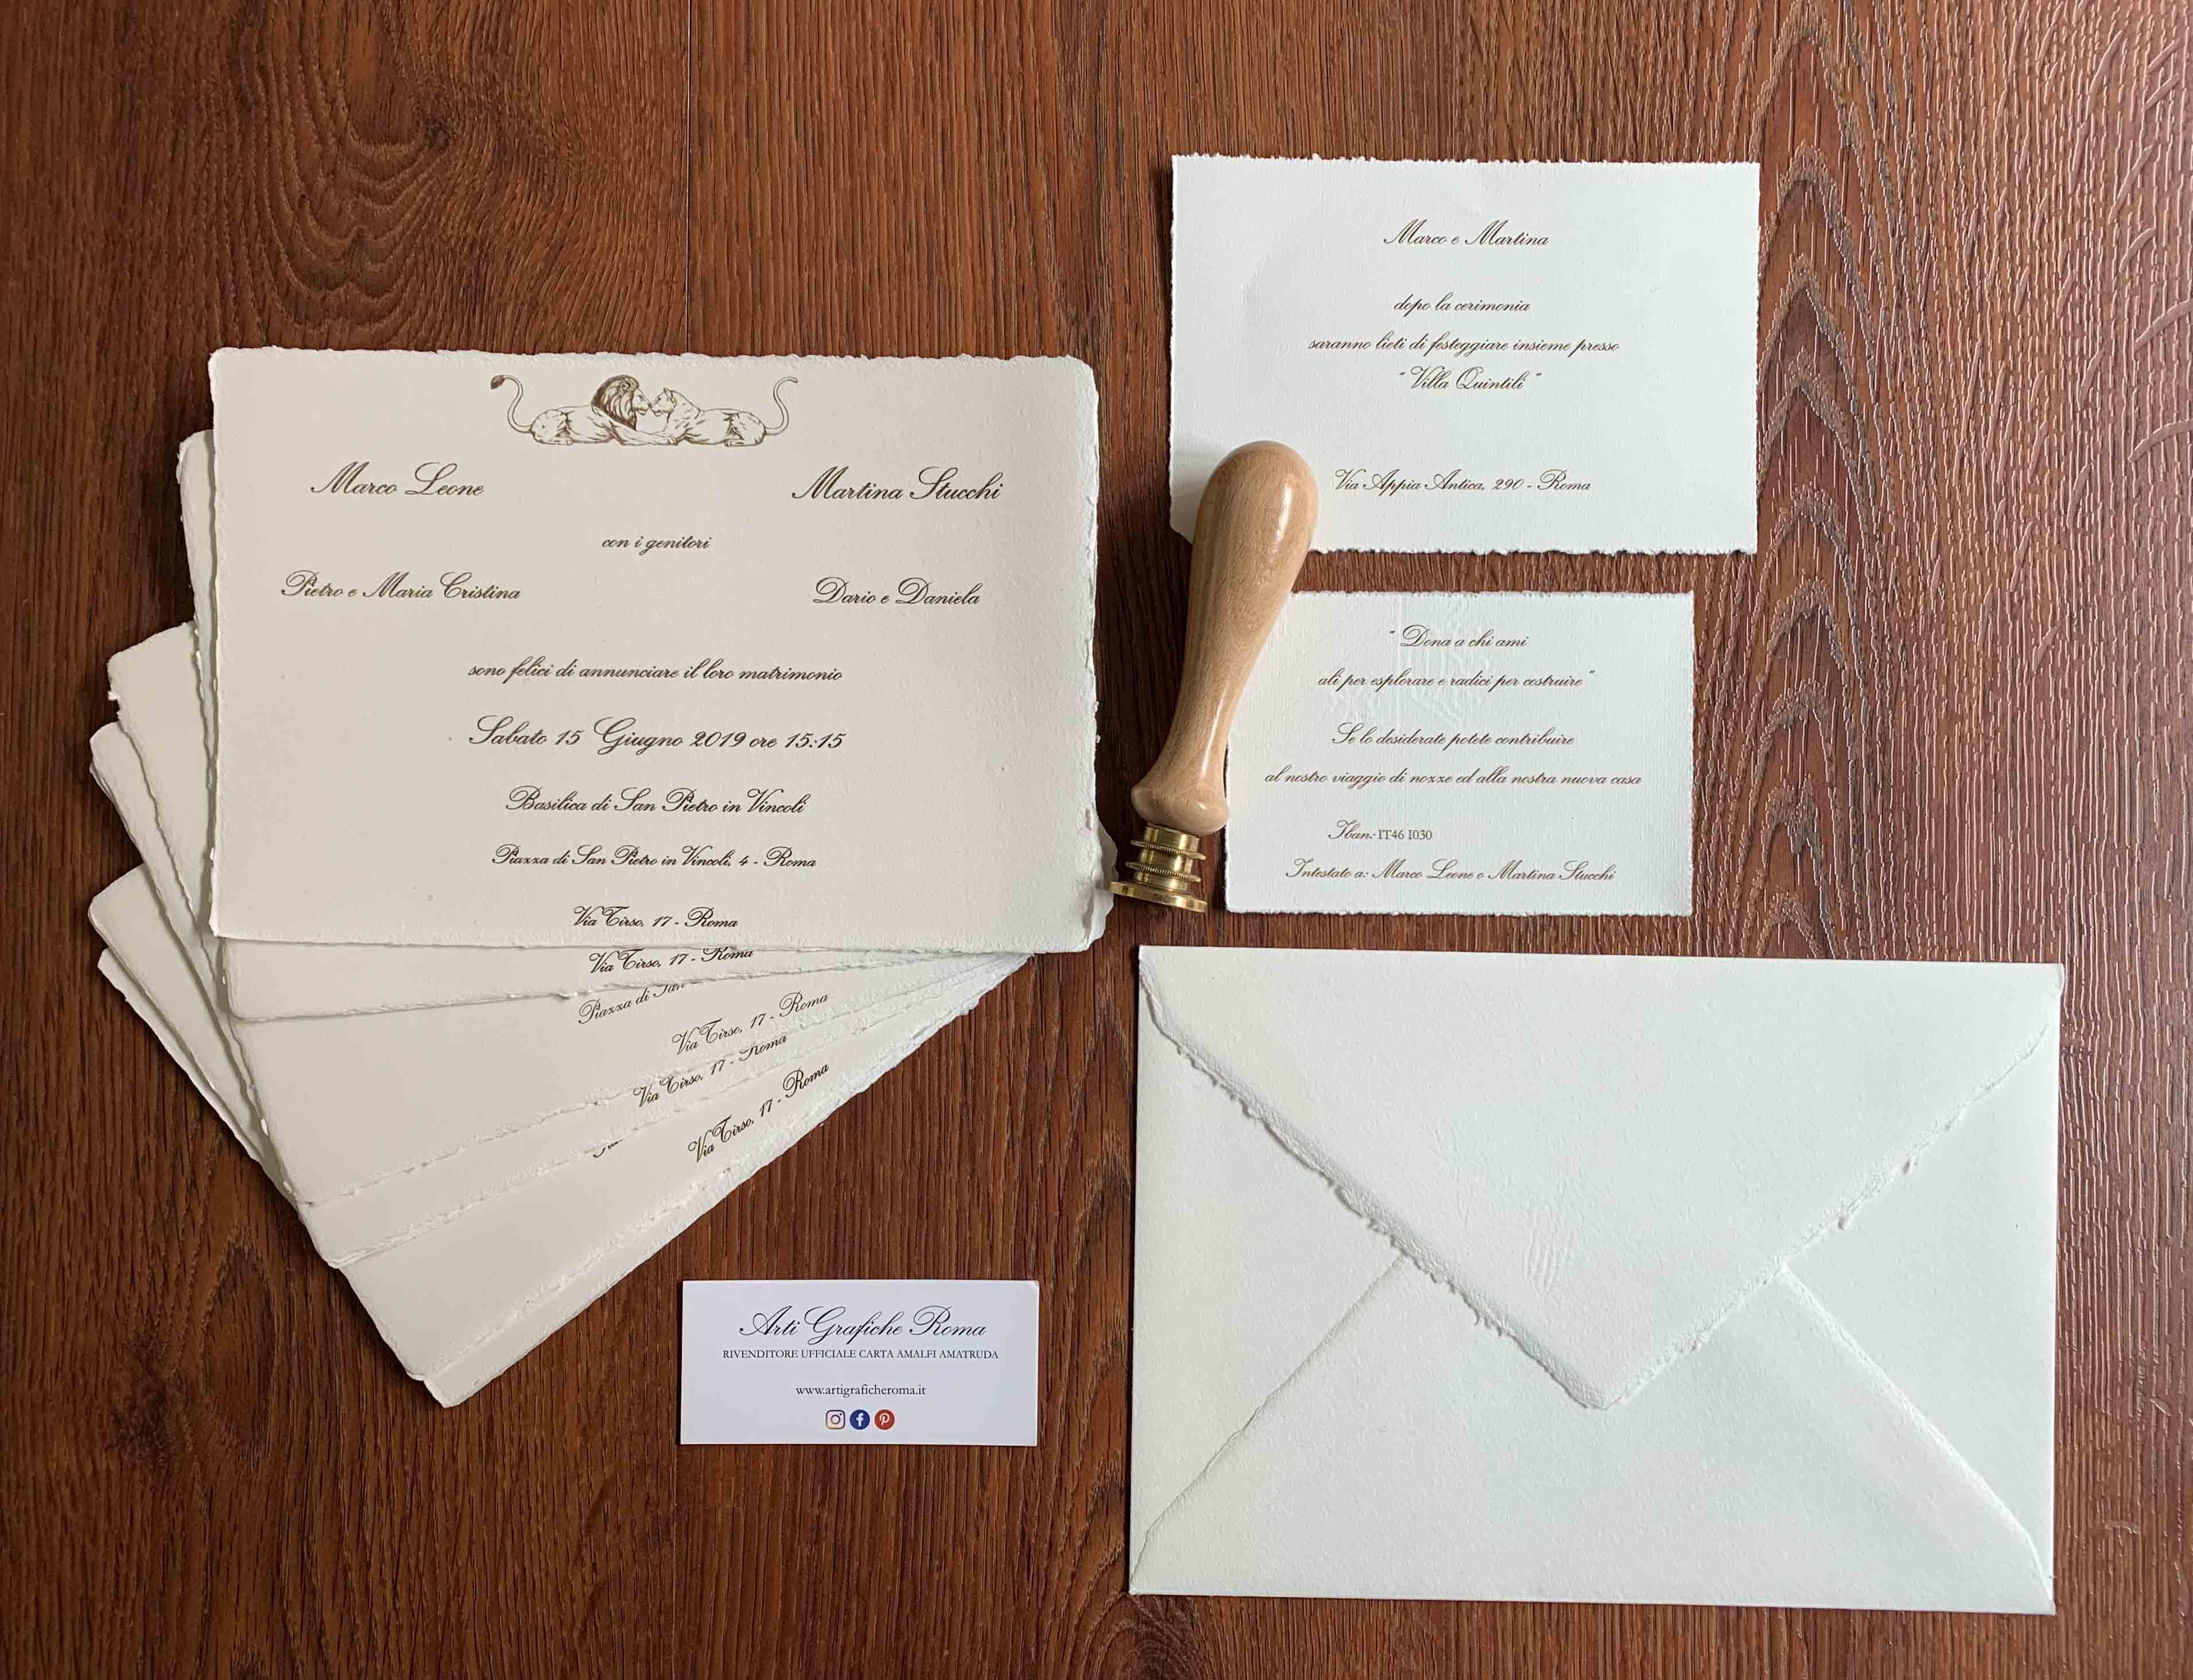 Partecipazioni Di Nozze In Carta Amalfi Partecipazioni Nozze Nozze Matrimonio Carta